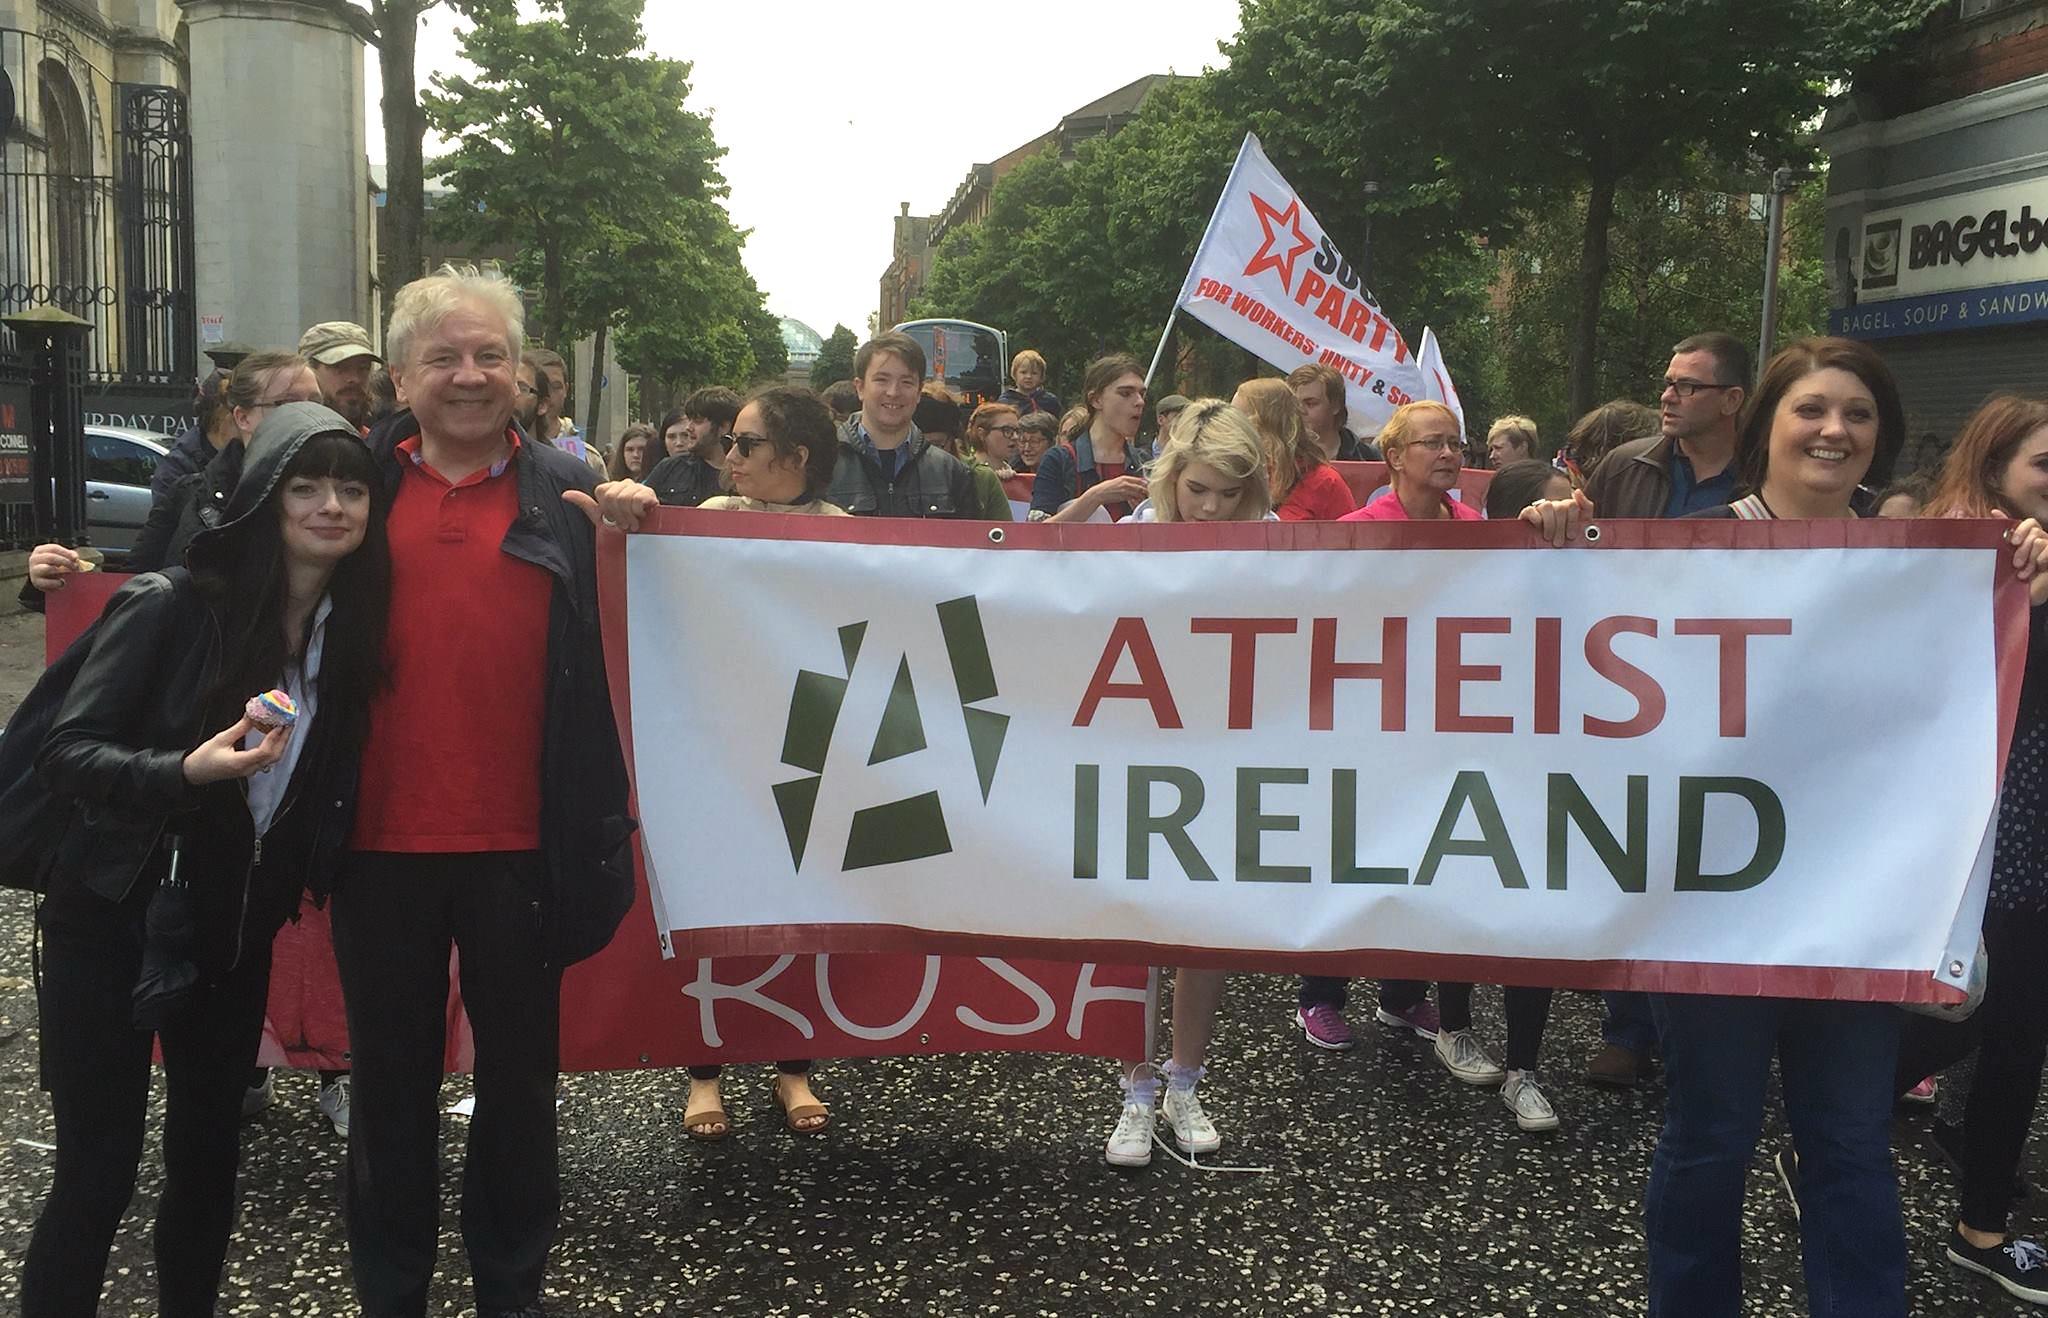 http://www.michaelnugent.com/wp-content/uploads/2016/07/PC-Belfast-2 ...